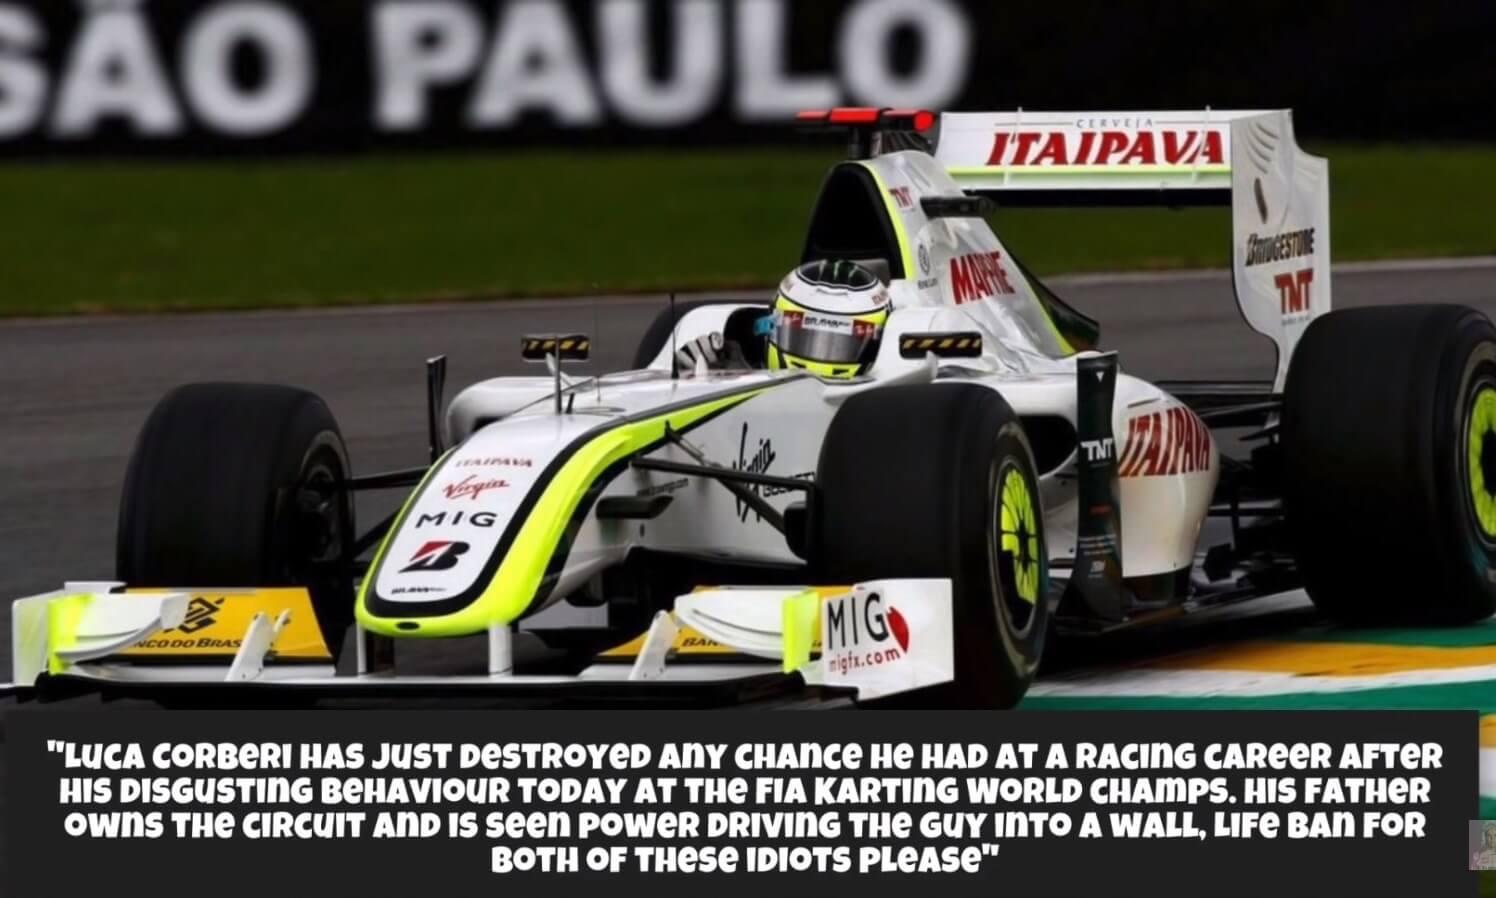 Hot Heads in Motorsport 5